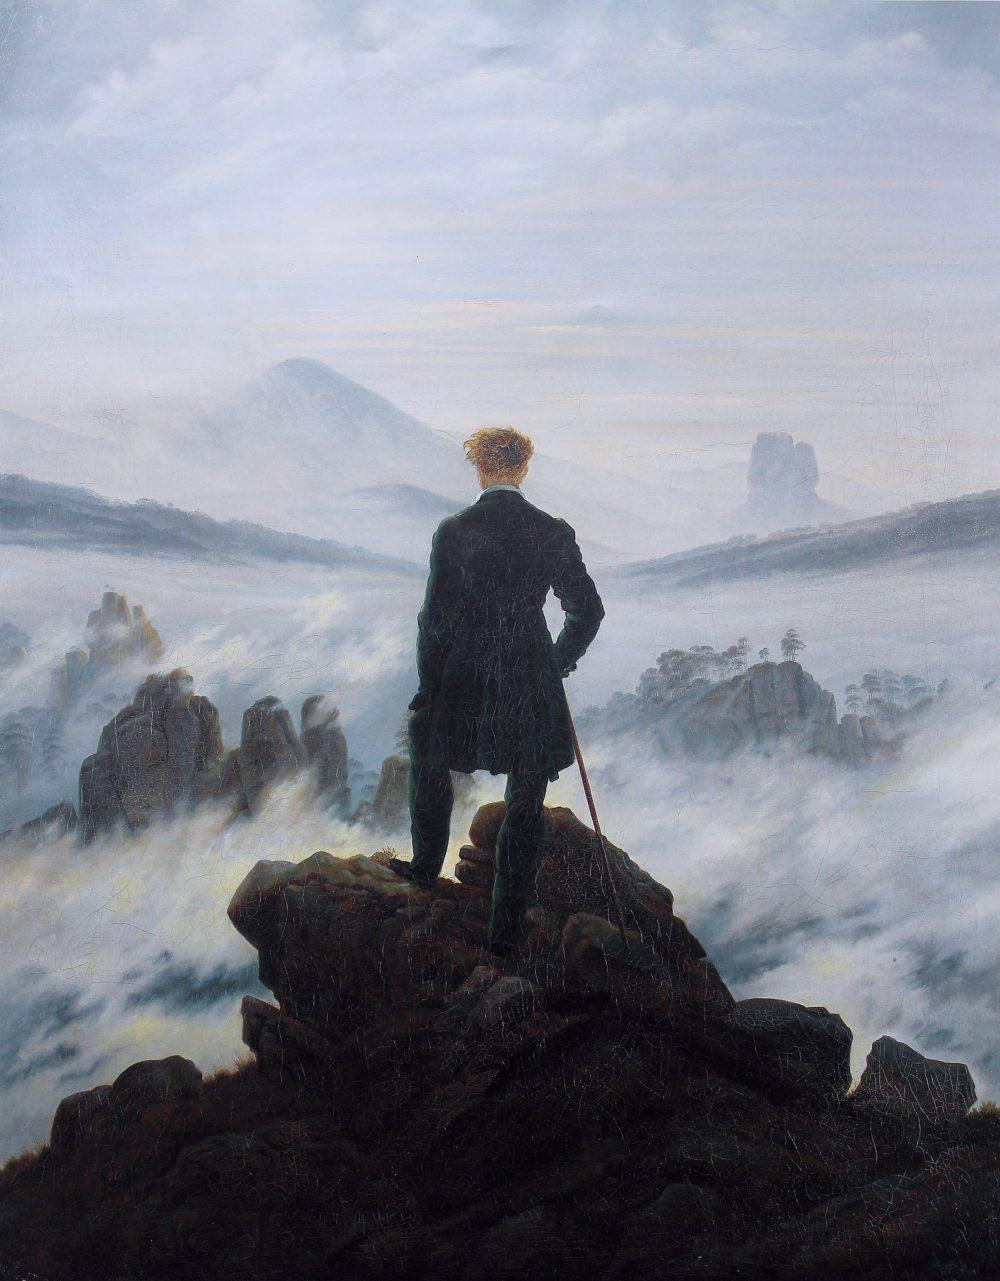 Caspar David Friedrich, Wanderer above the Sea of Fog (1818)